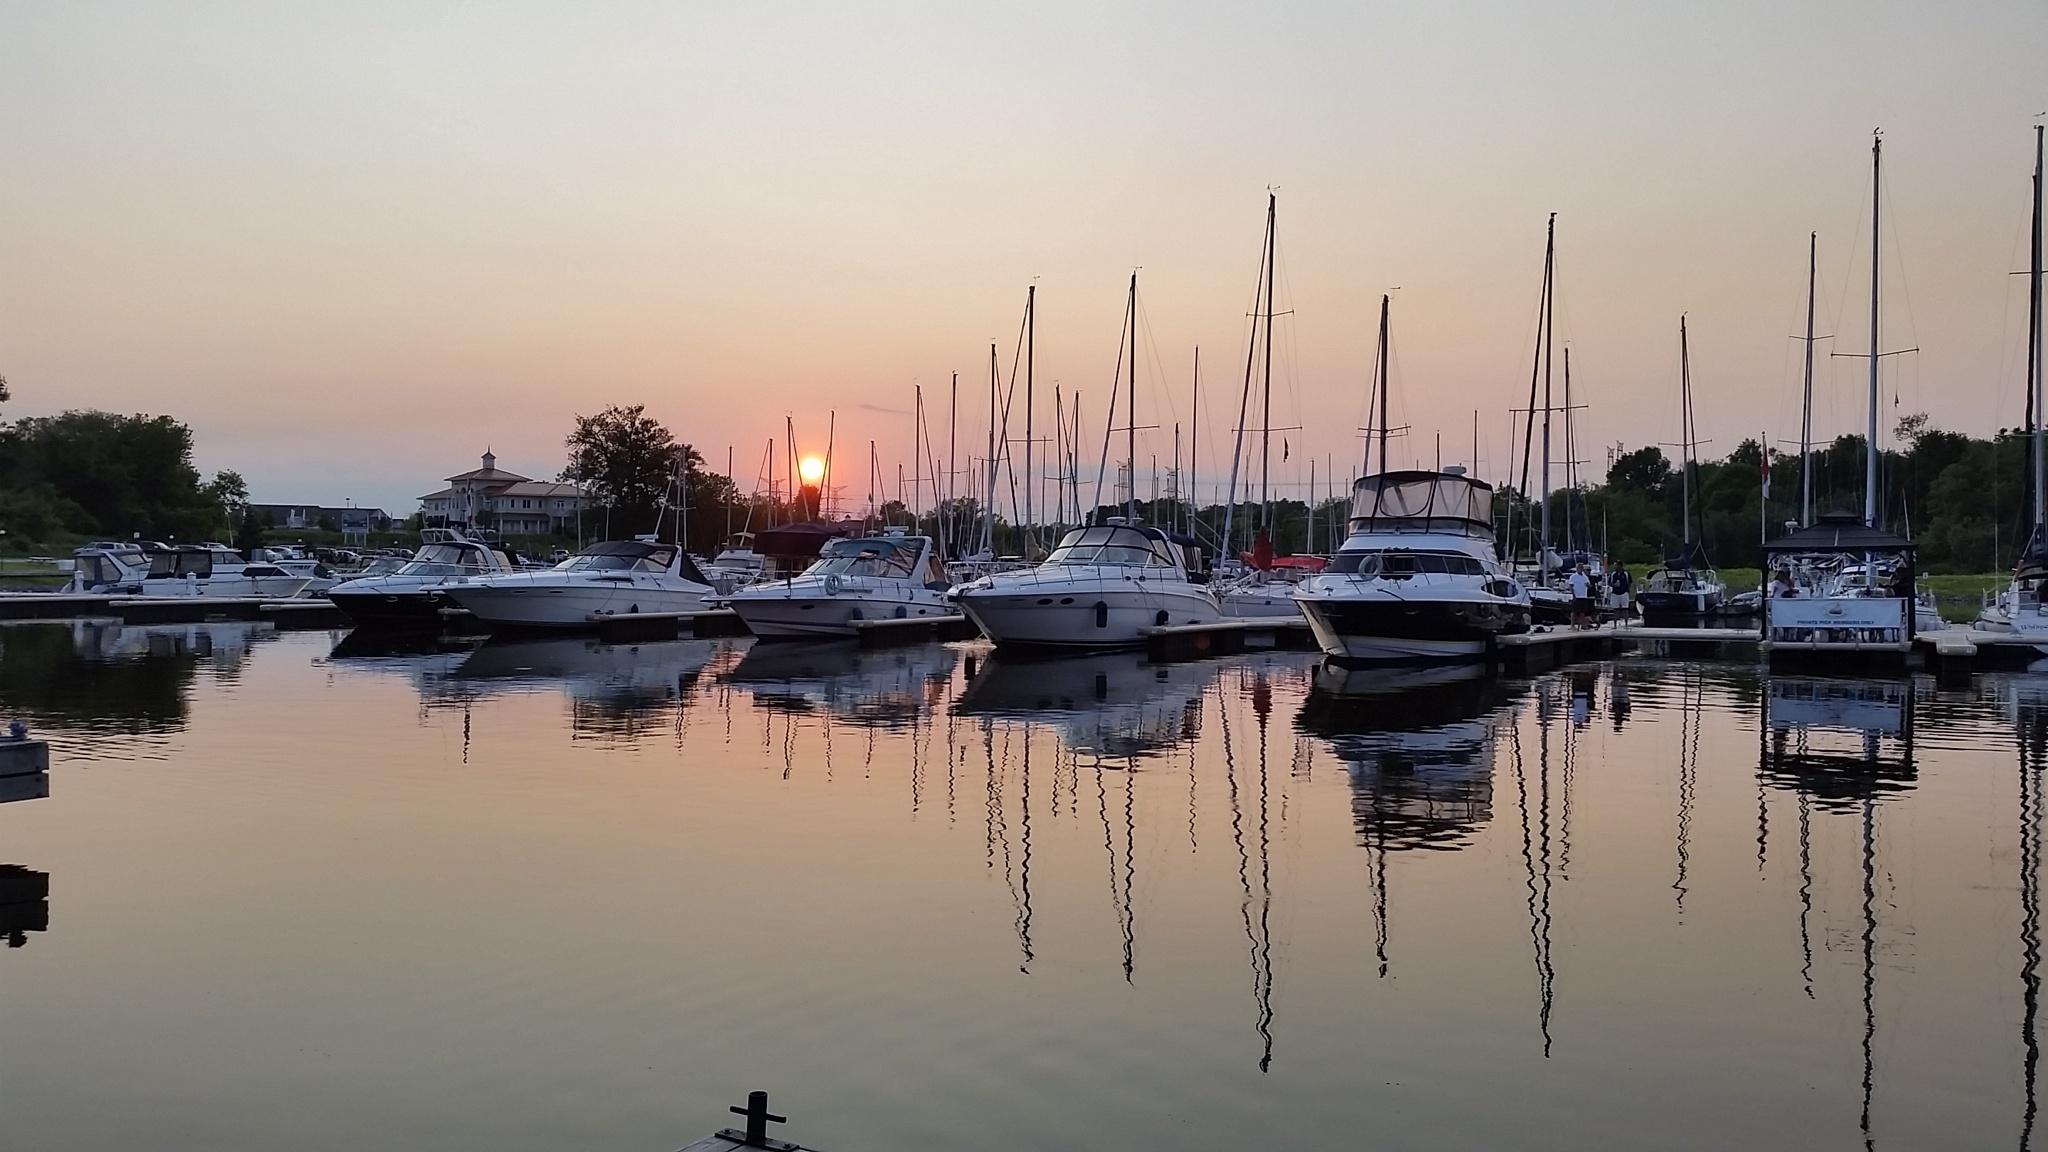 Sunset over marina by Robert Greig